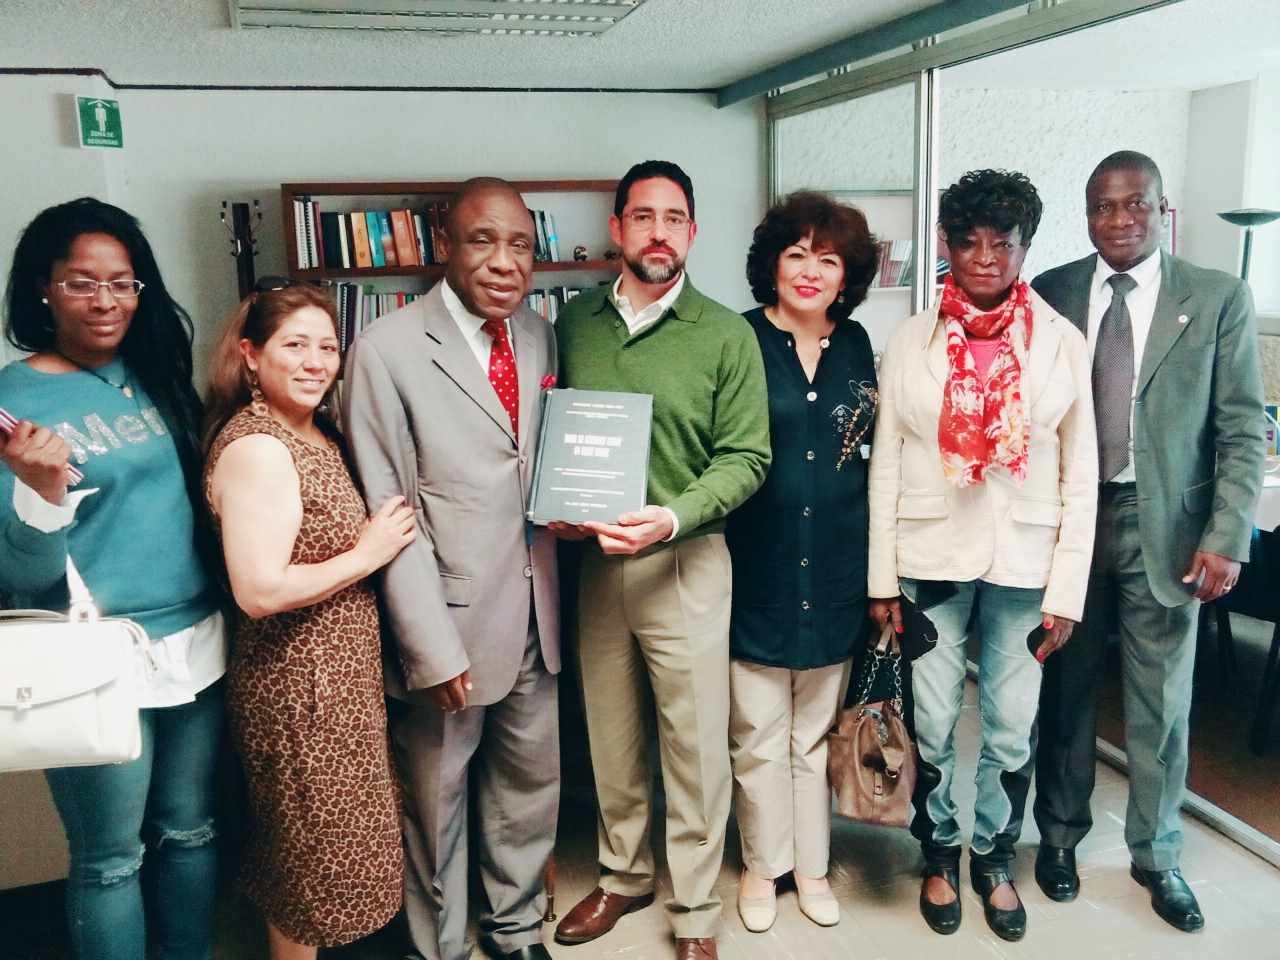 Visita de Embajador de Costa de Marfil a la FCPyS-UNAM